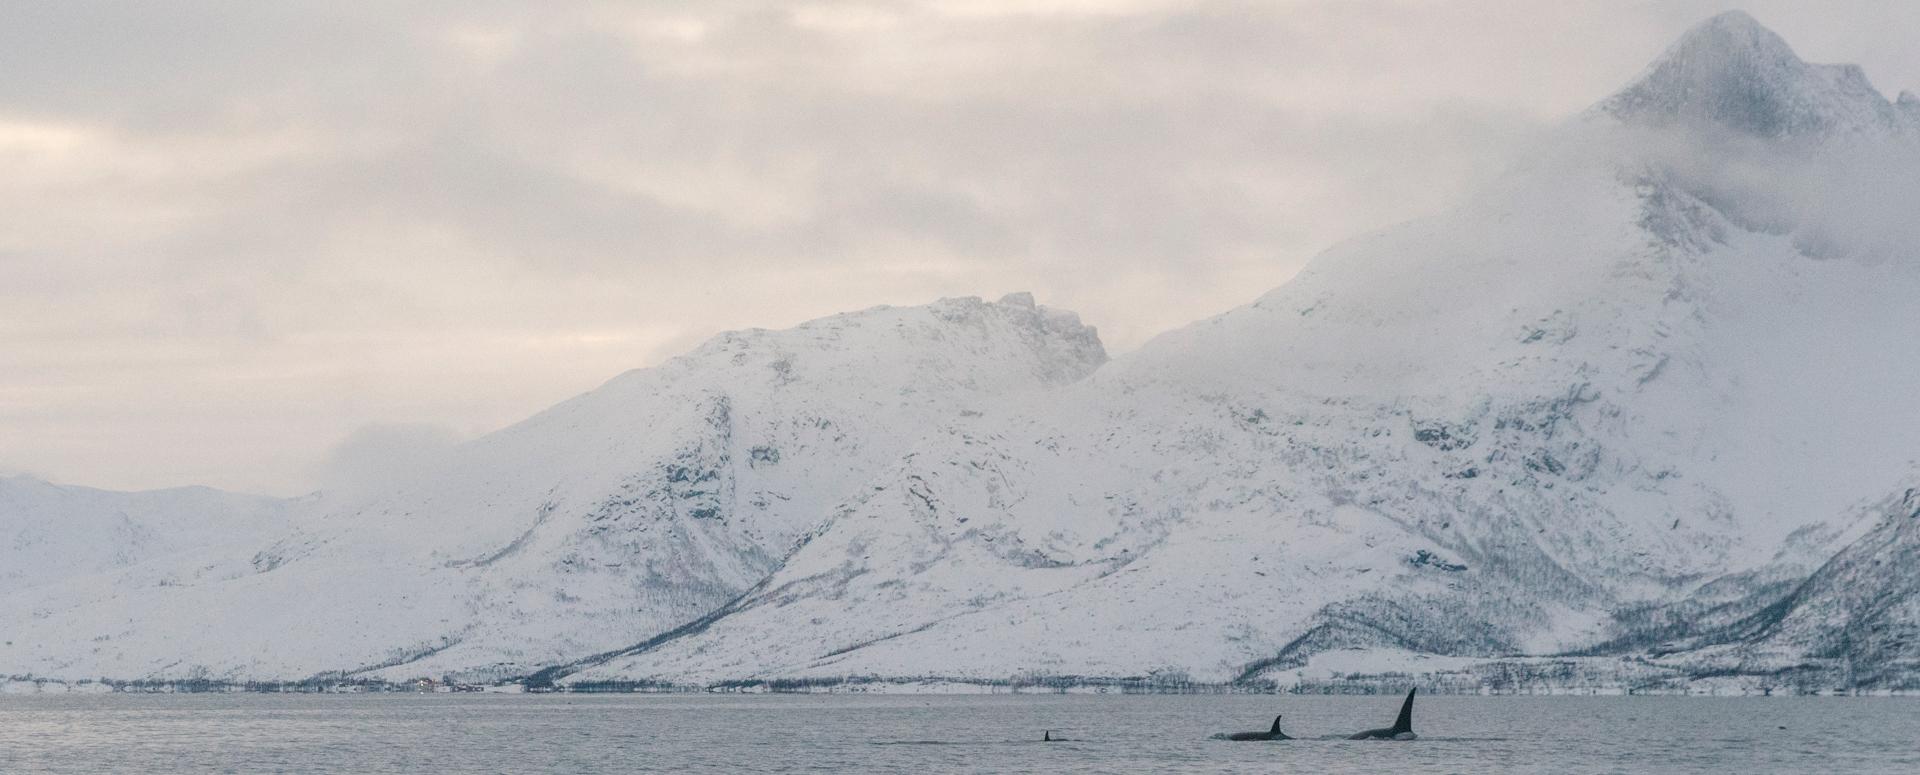 Orca Whale Watching Tromsø ©phototravelnomads.com